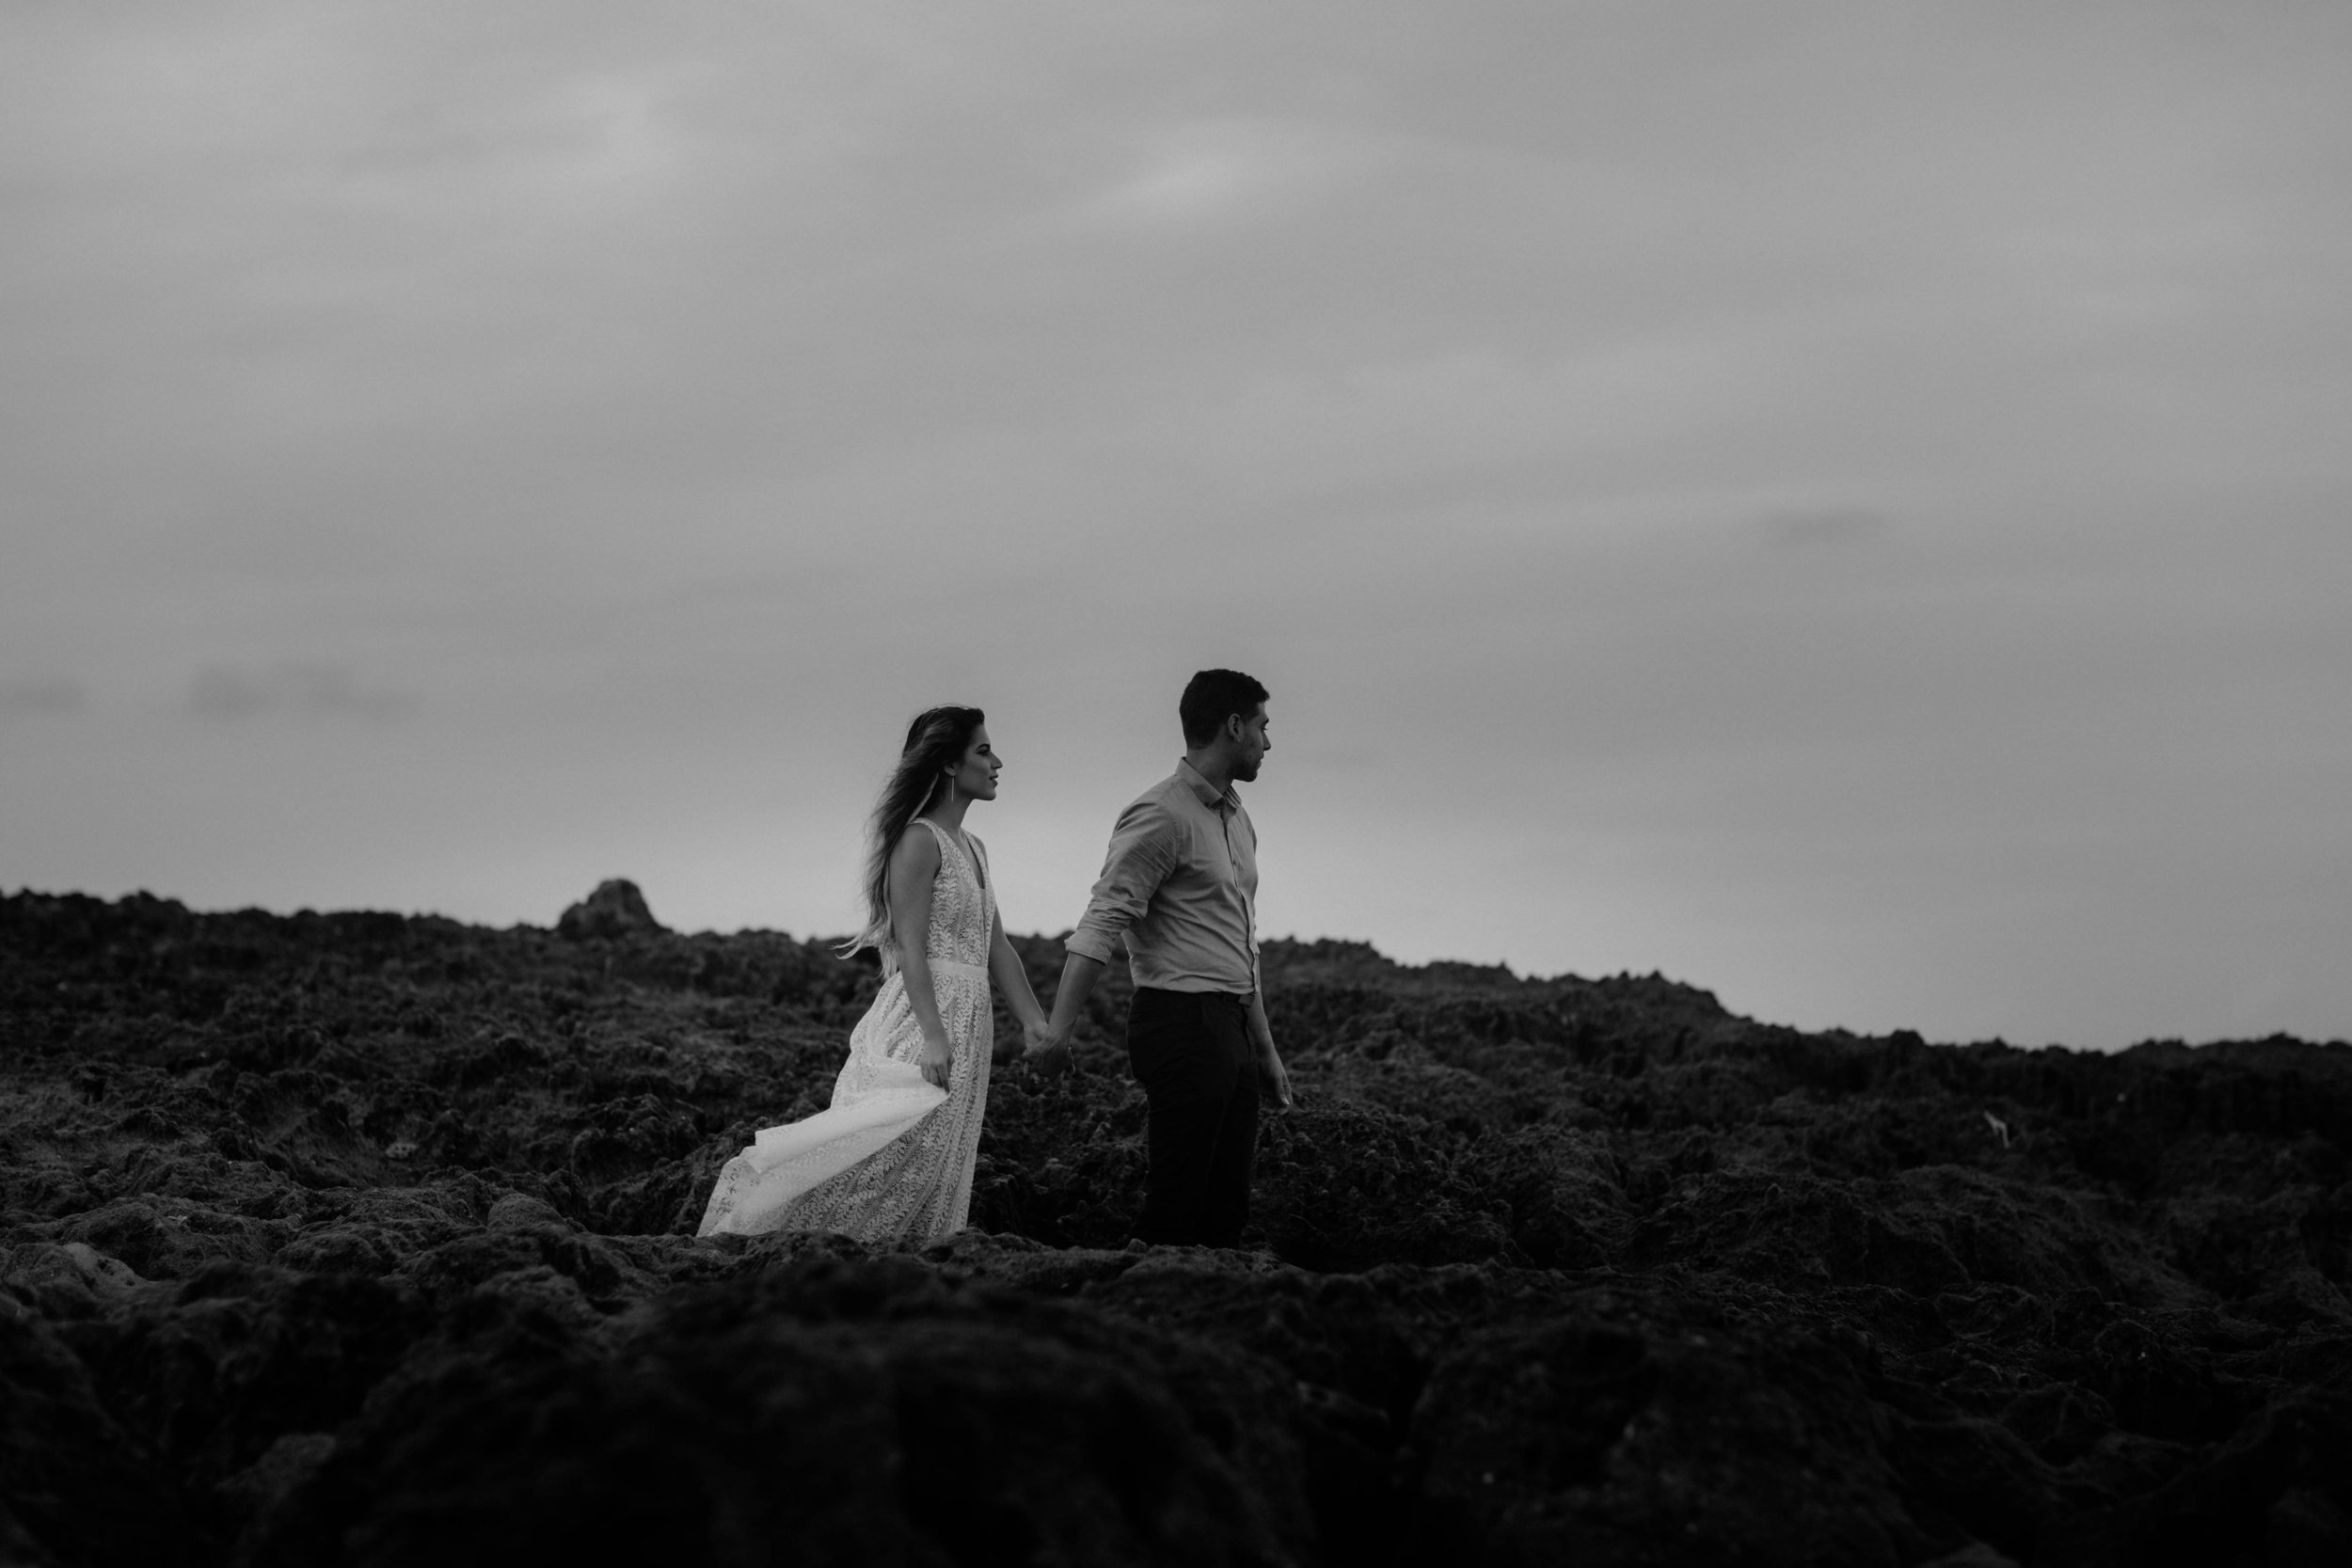 Engagement Session | Kiara Marie and Calixto |  © Vanessa Boy | vanessaboy.com-221.jpg